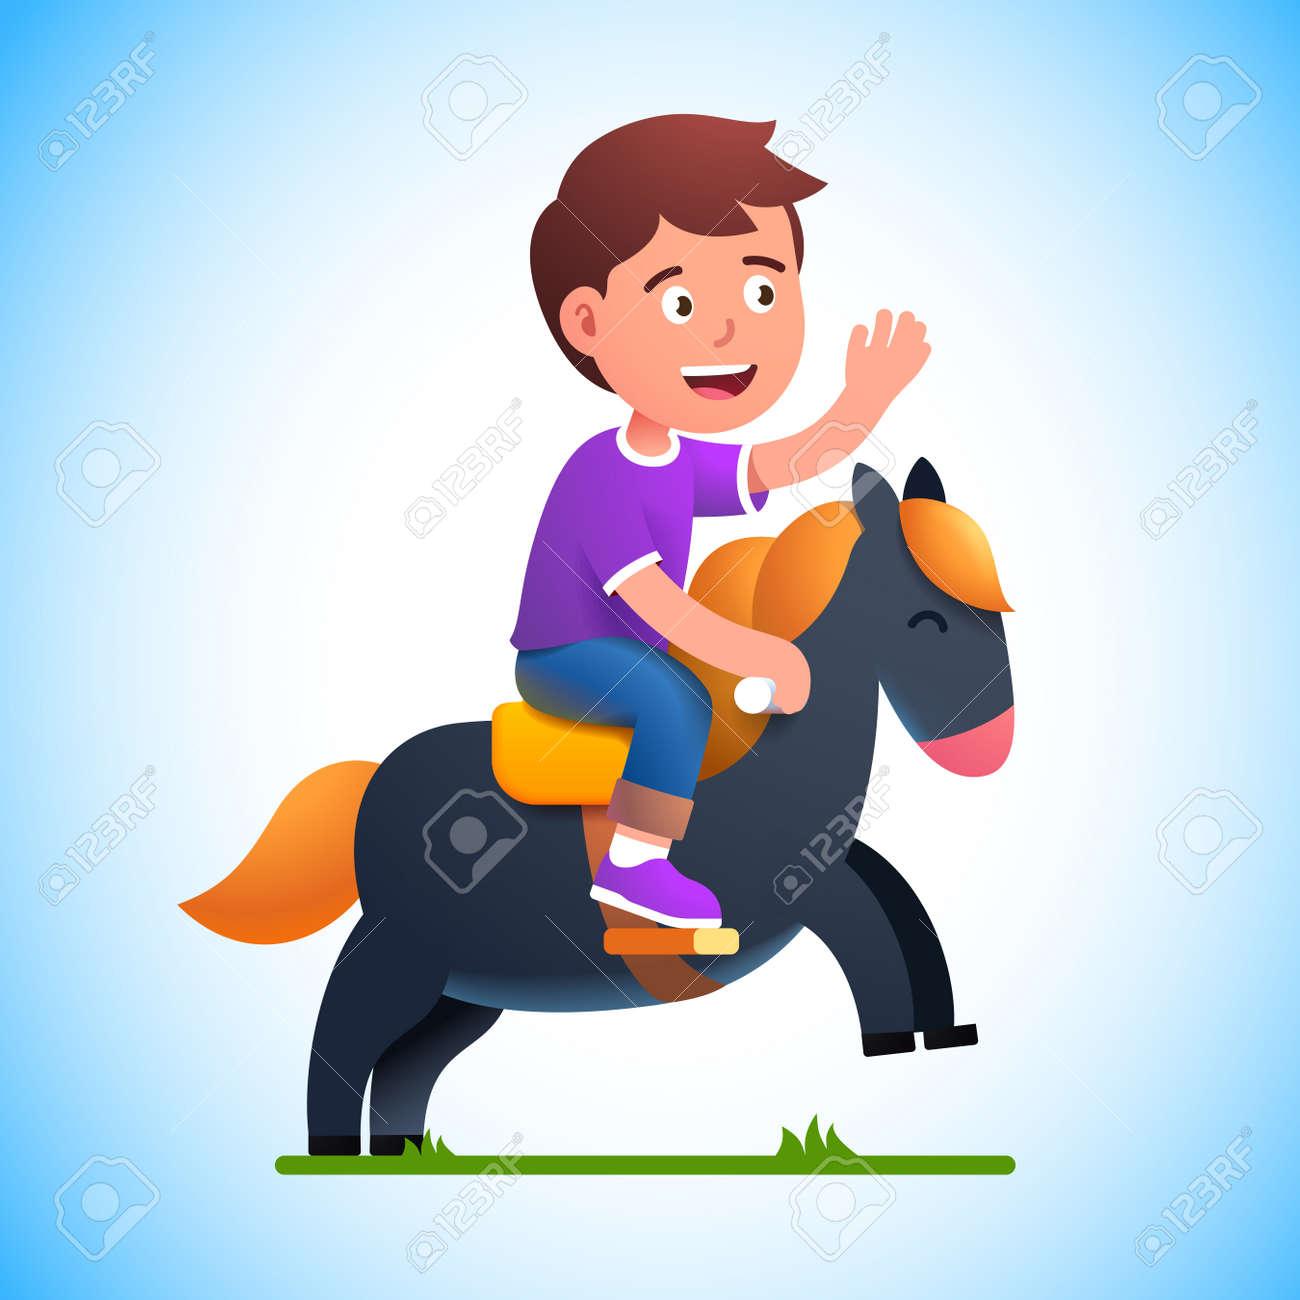 Preschool kid boy play riding toy horse - 153086094